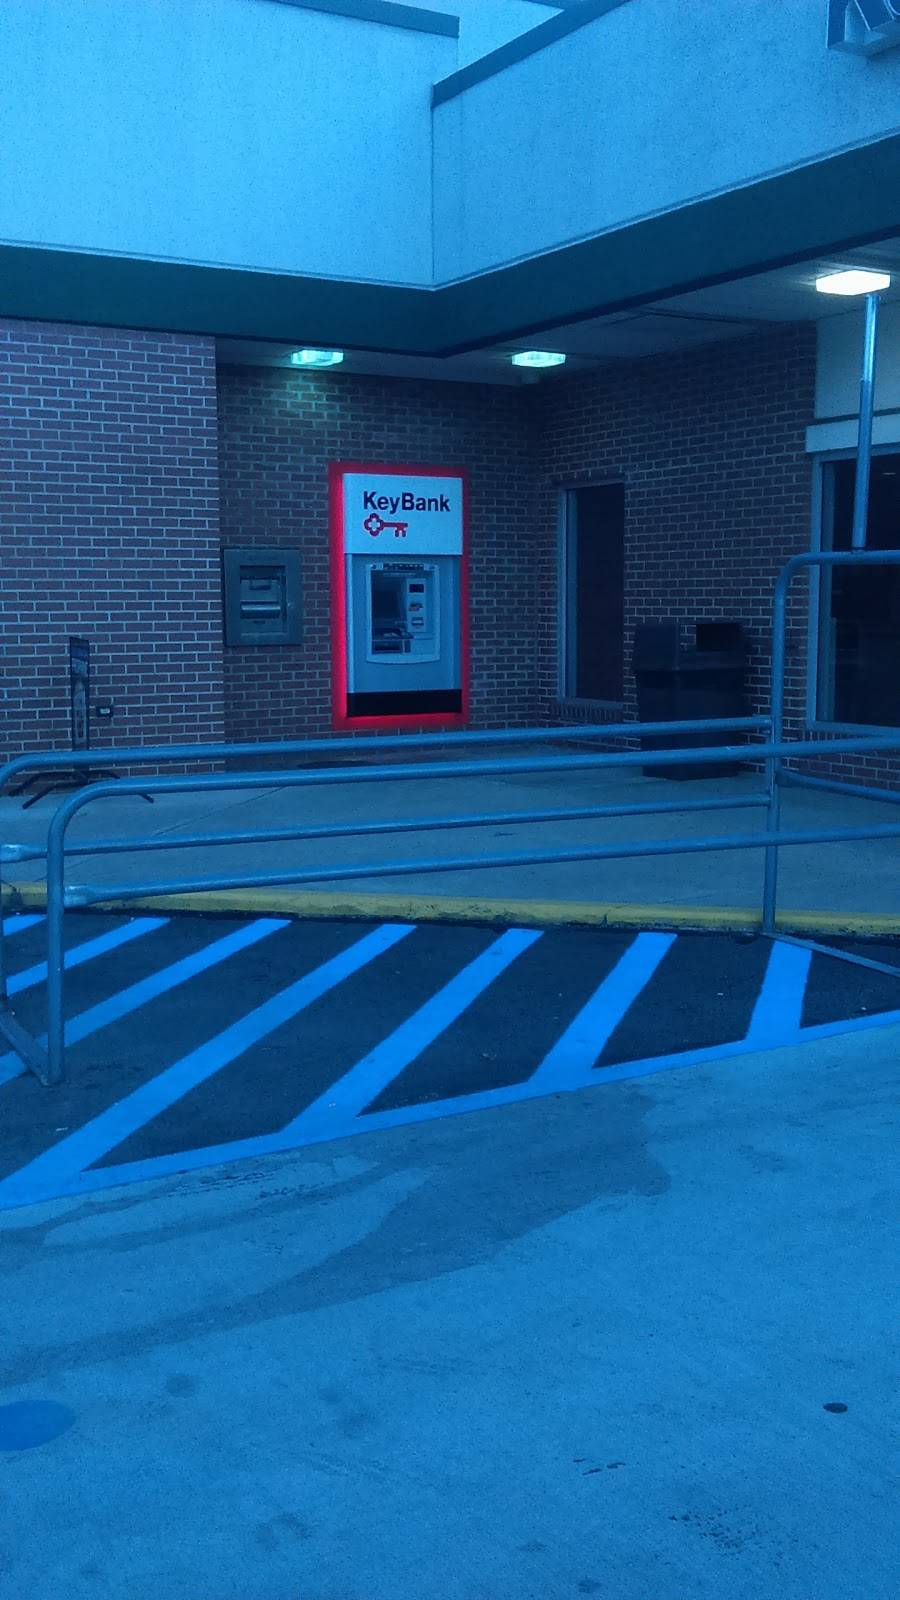 KeyBank ATM - atm  | Photo 2 of 2 | Address: 810 McKeesport Rd, Elizabeth, PA 15037, USA | Phone: (800) 539-2968